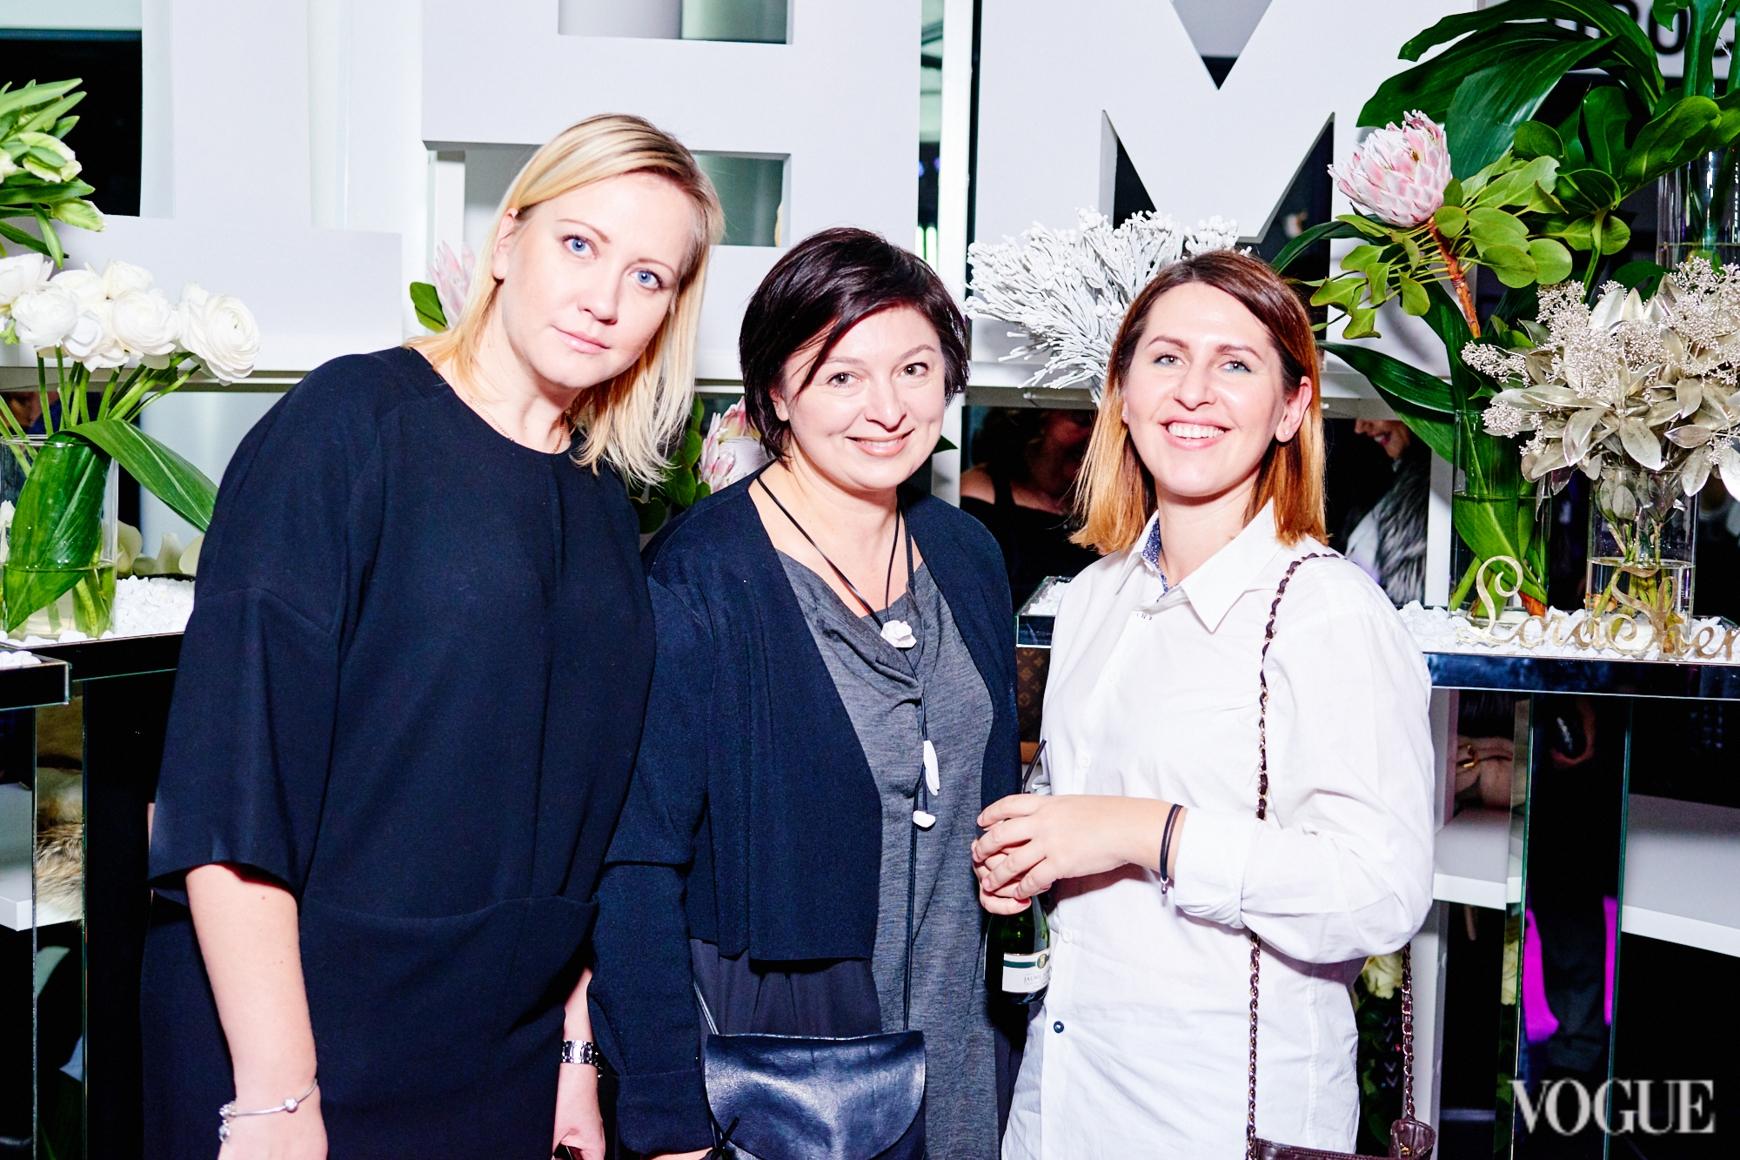 Оксана Циндинская, Кристина Бобкова и Алена Пономаренко